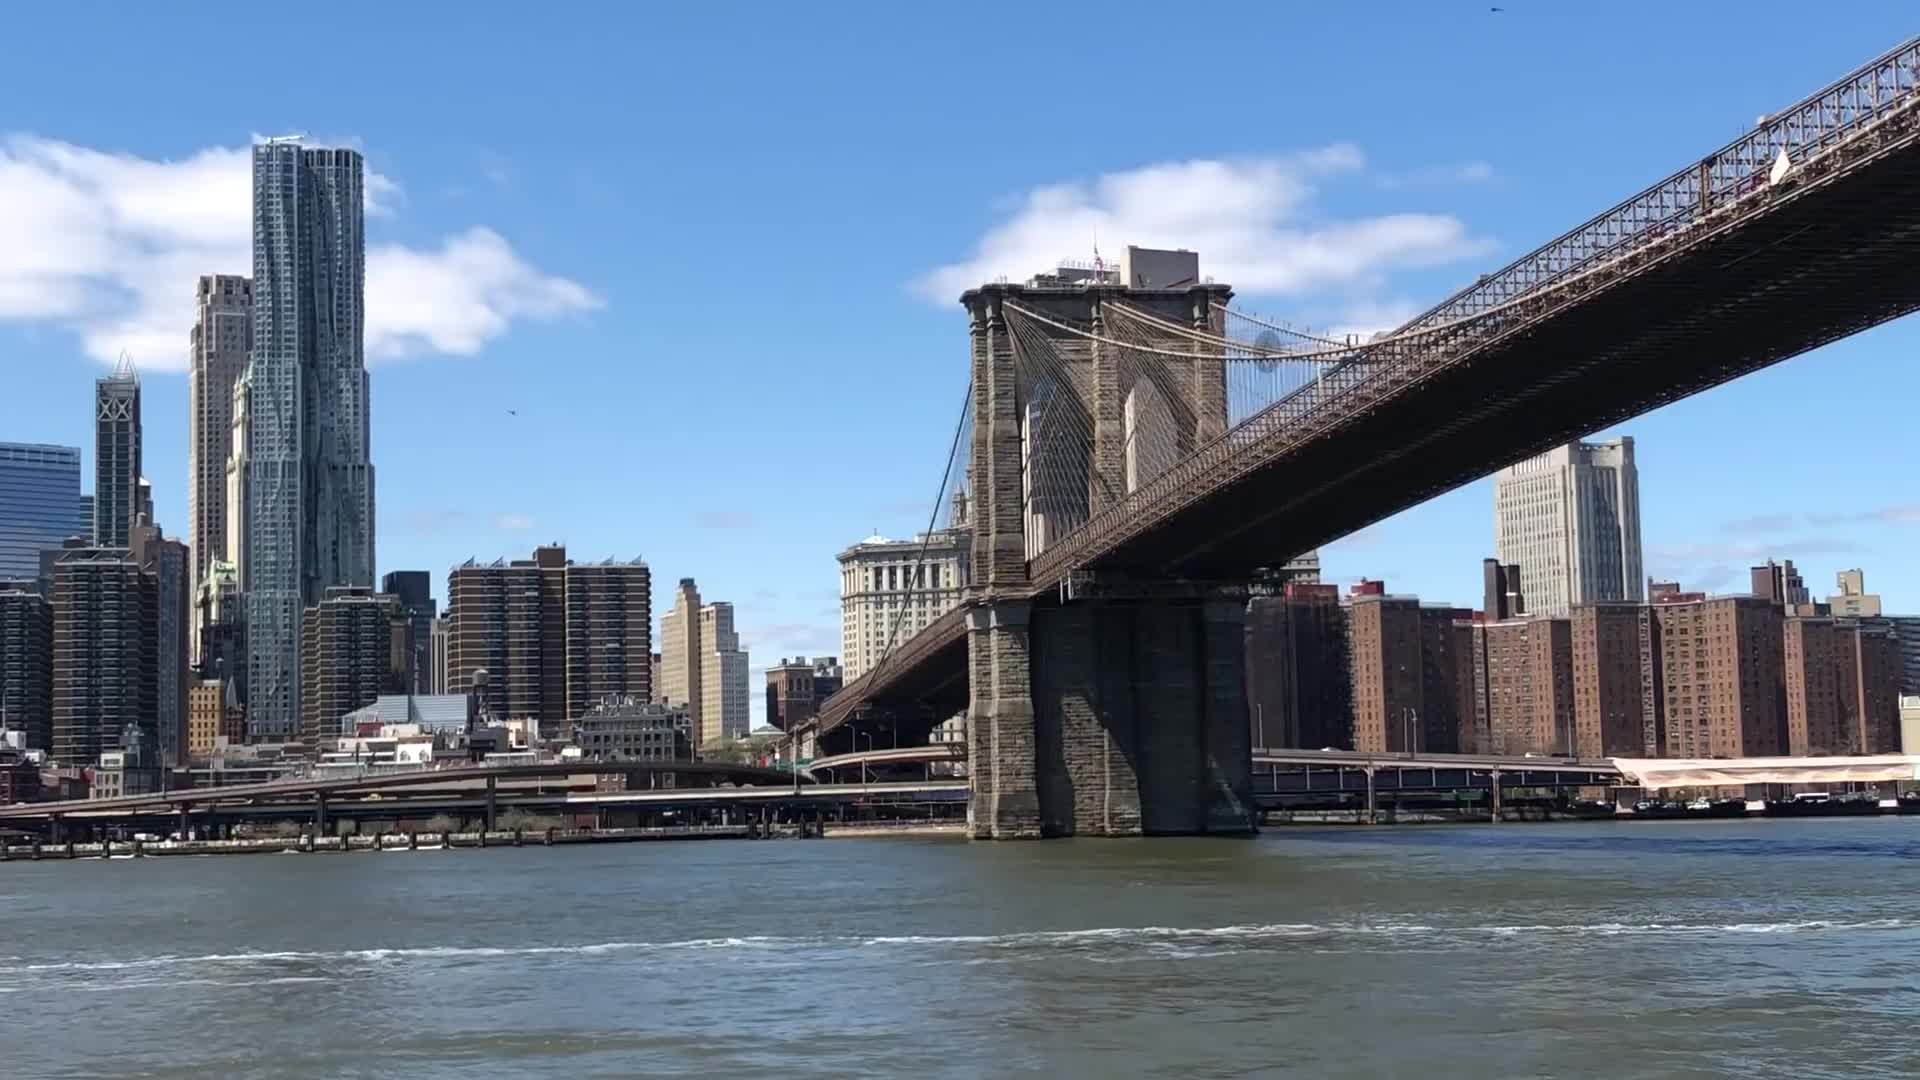 Brooklyn Bridge New York City NYC Helicopter Chopper East Ri, Military helicopter flyby underneath the Brooklyn Bridge in NYC GIFs